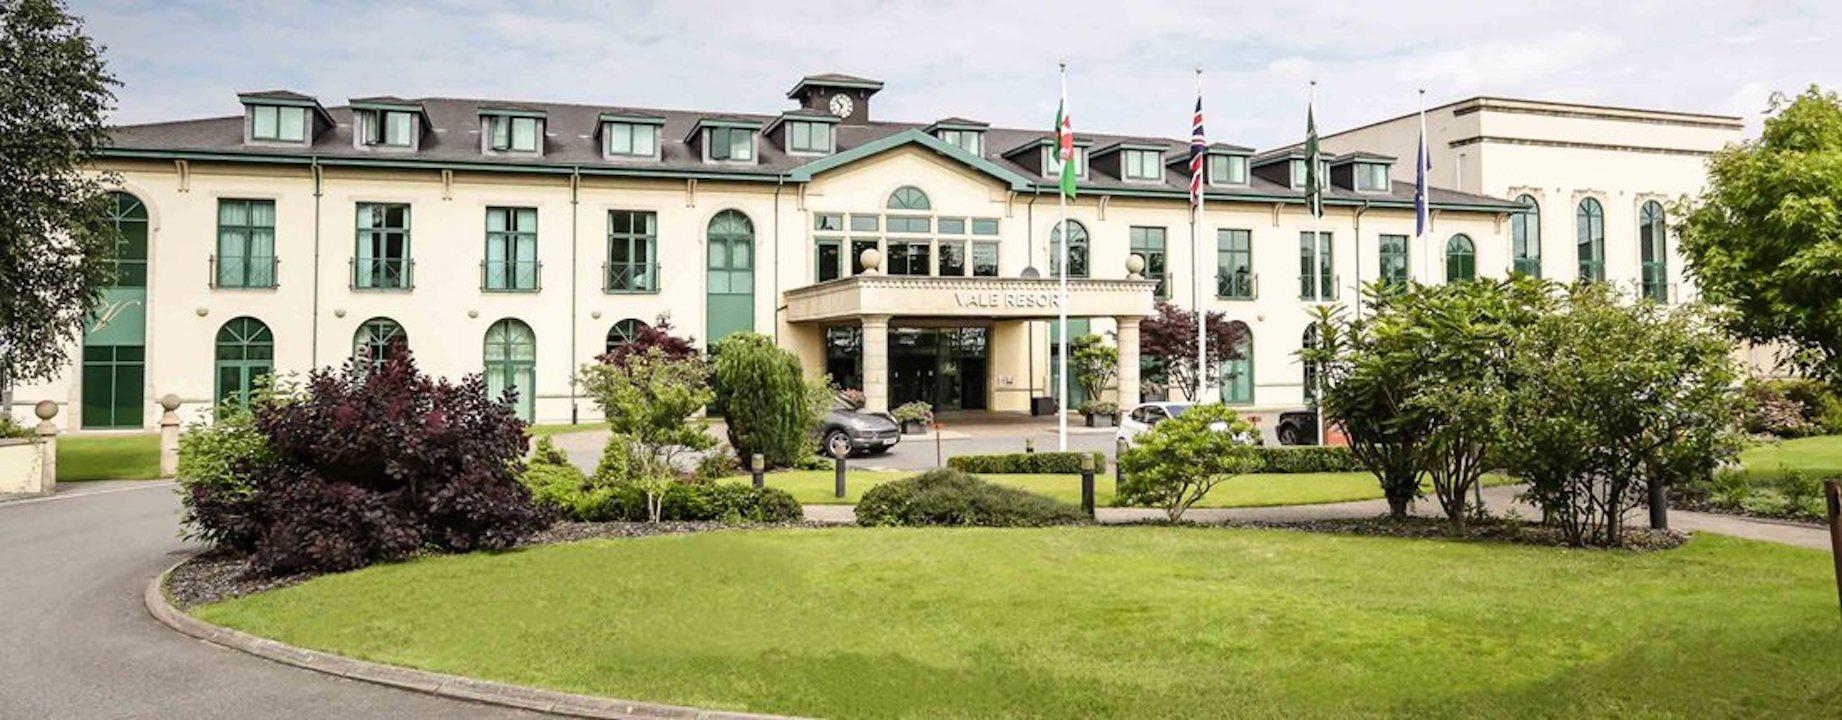 Vale Resort ****L & Hensol Castel Golf spa and Leisure hotel , Cardiff - United Kingdom